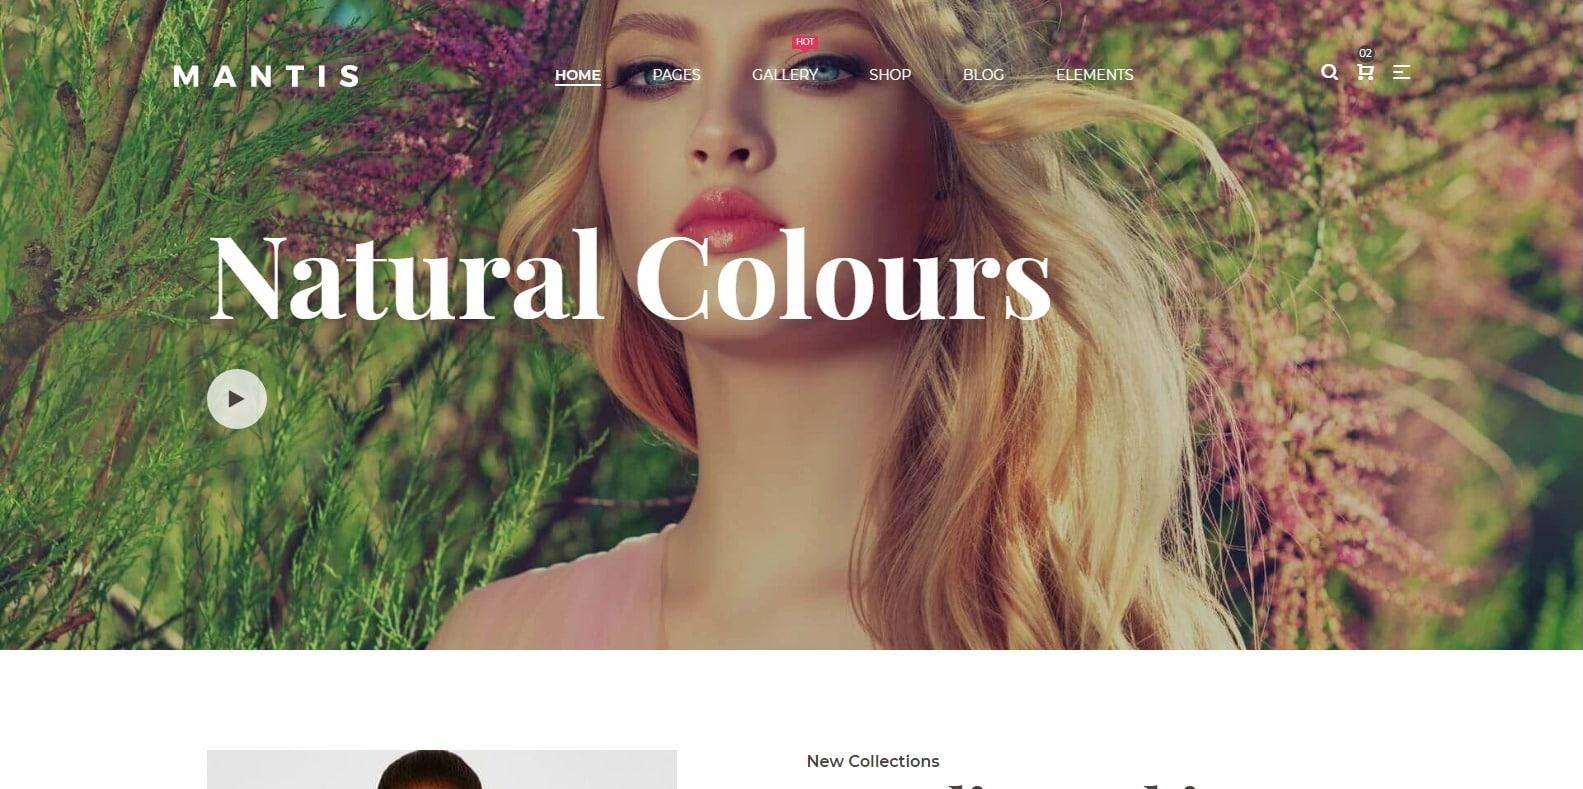 mantis-simple-website-template